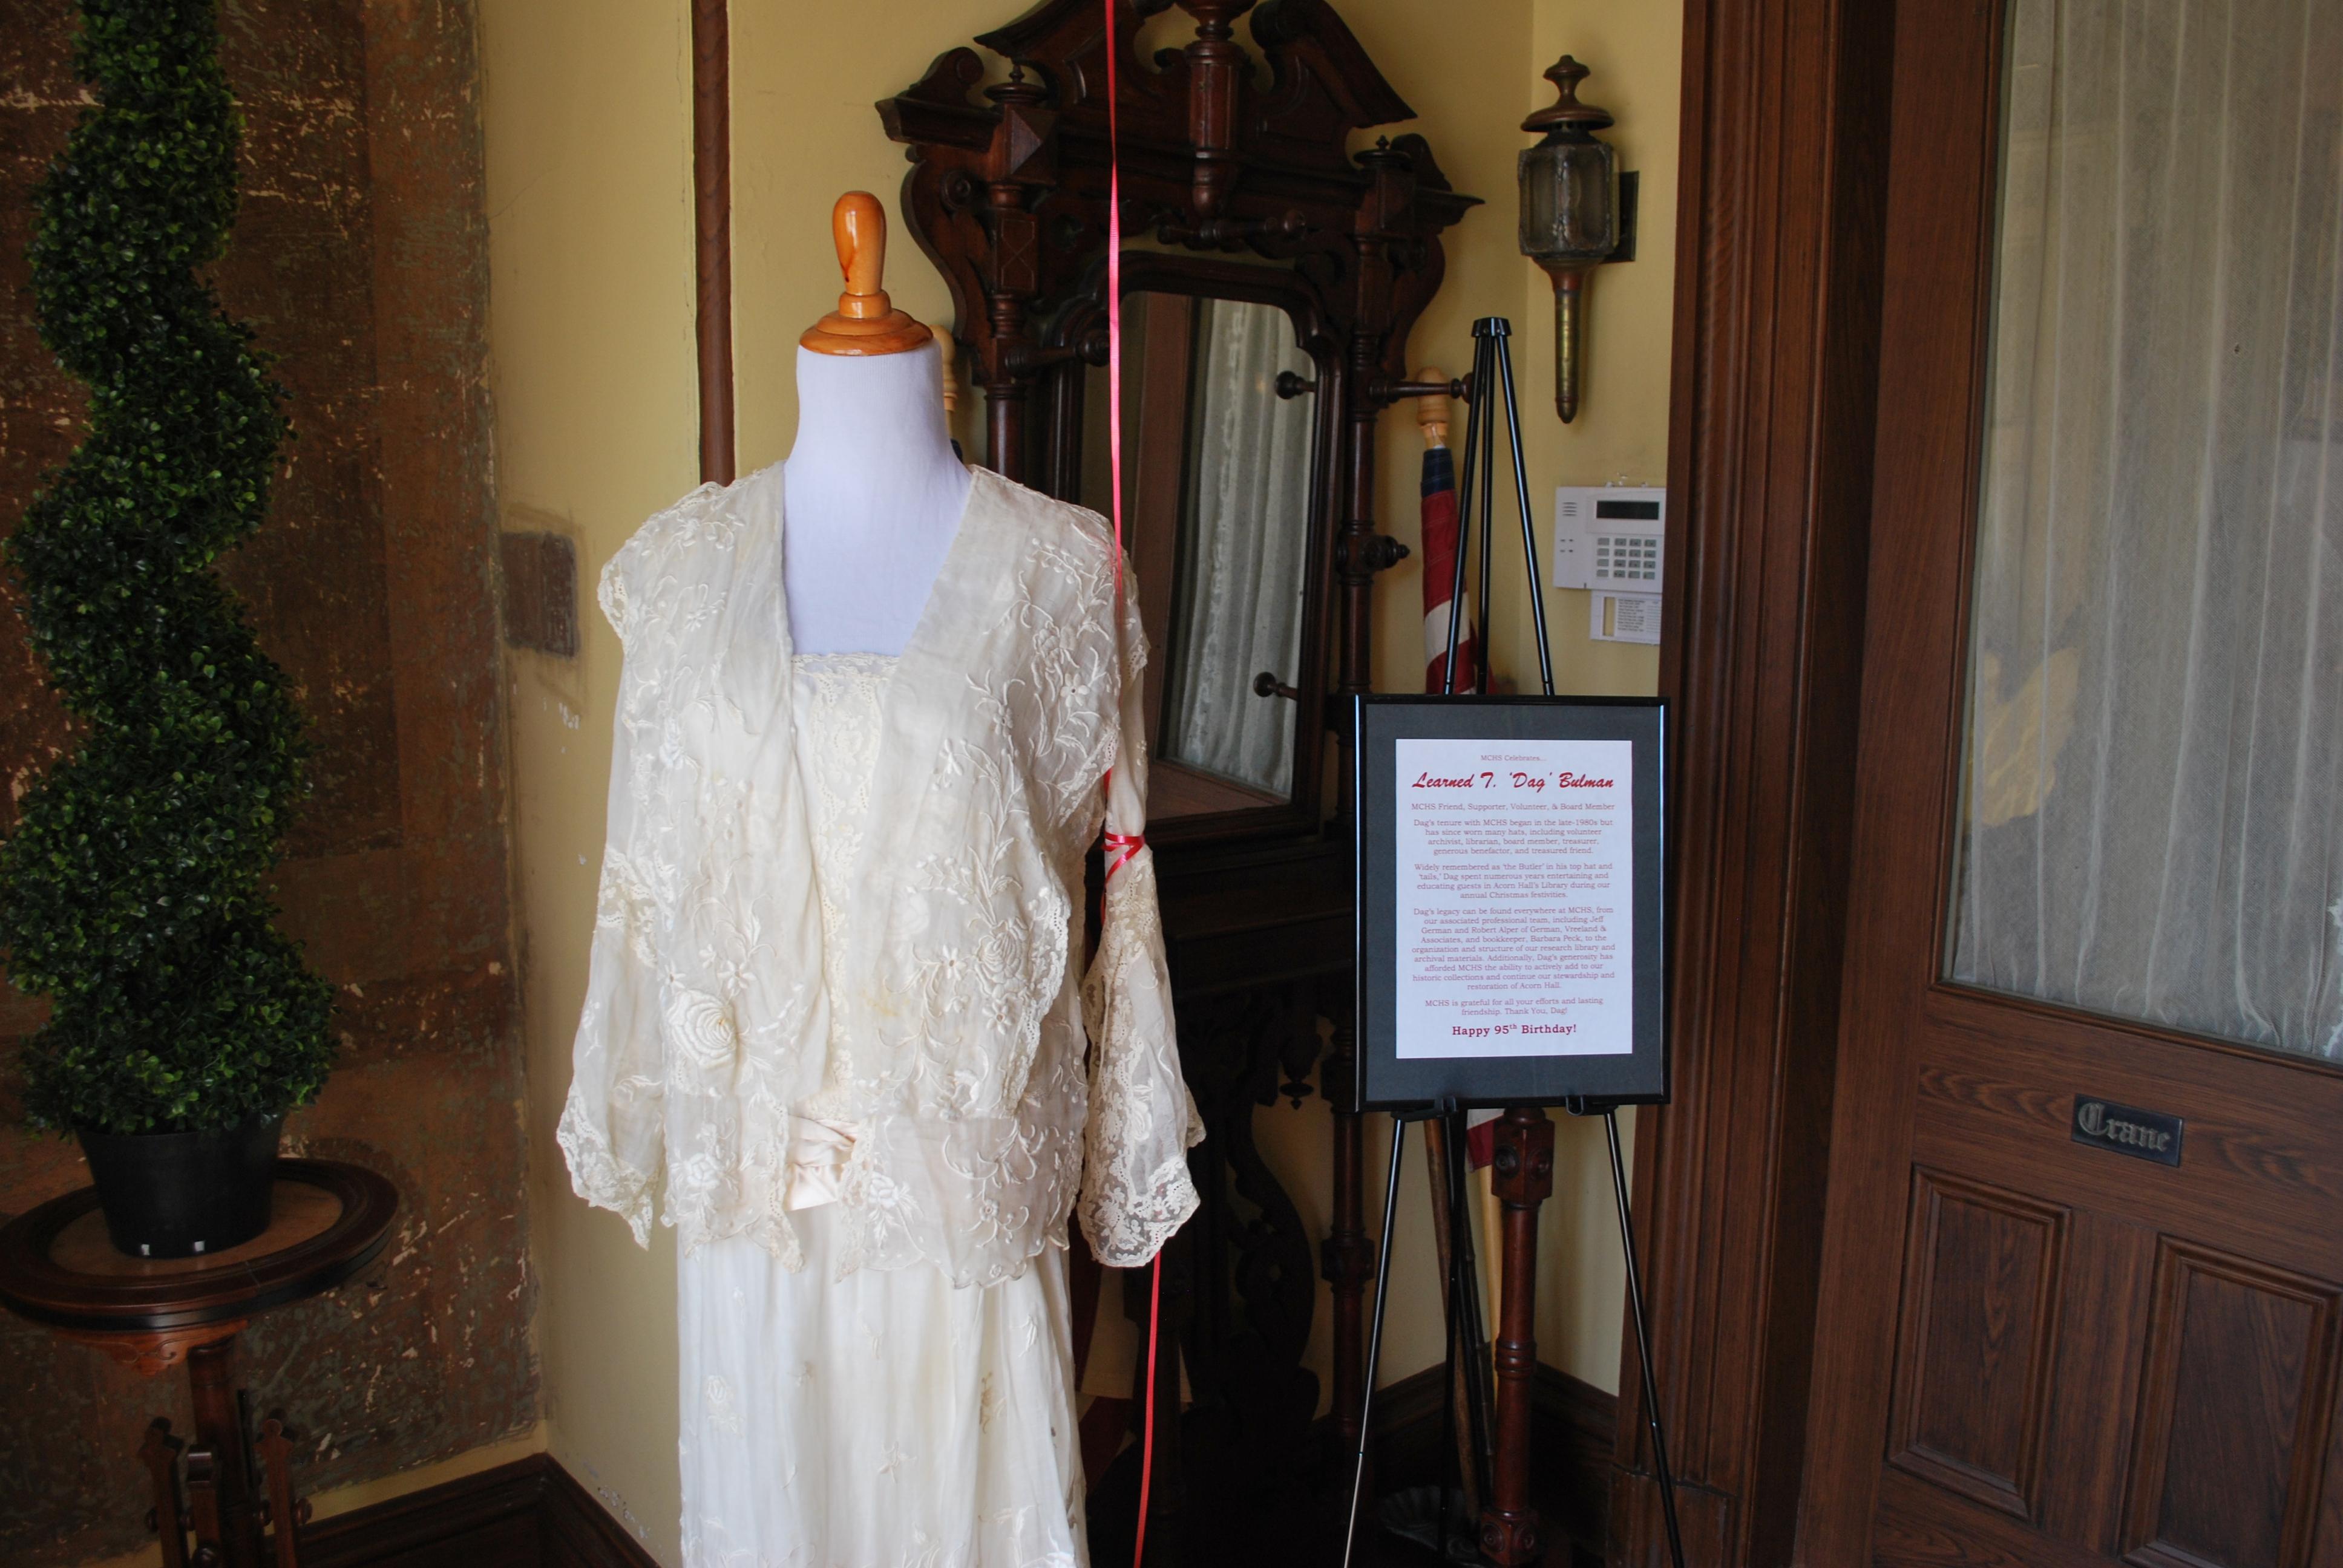 Happy 95th Birthday Dag: Fashions of the 1920s